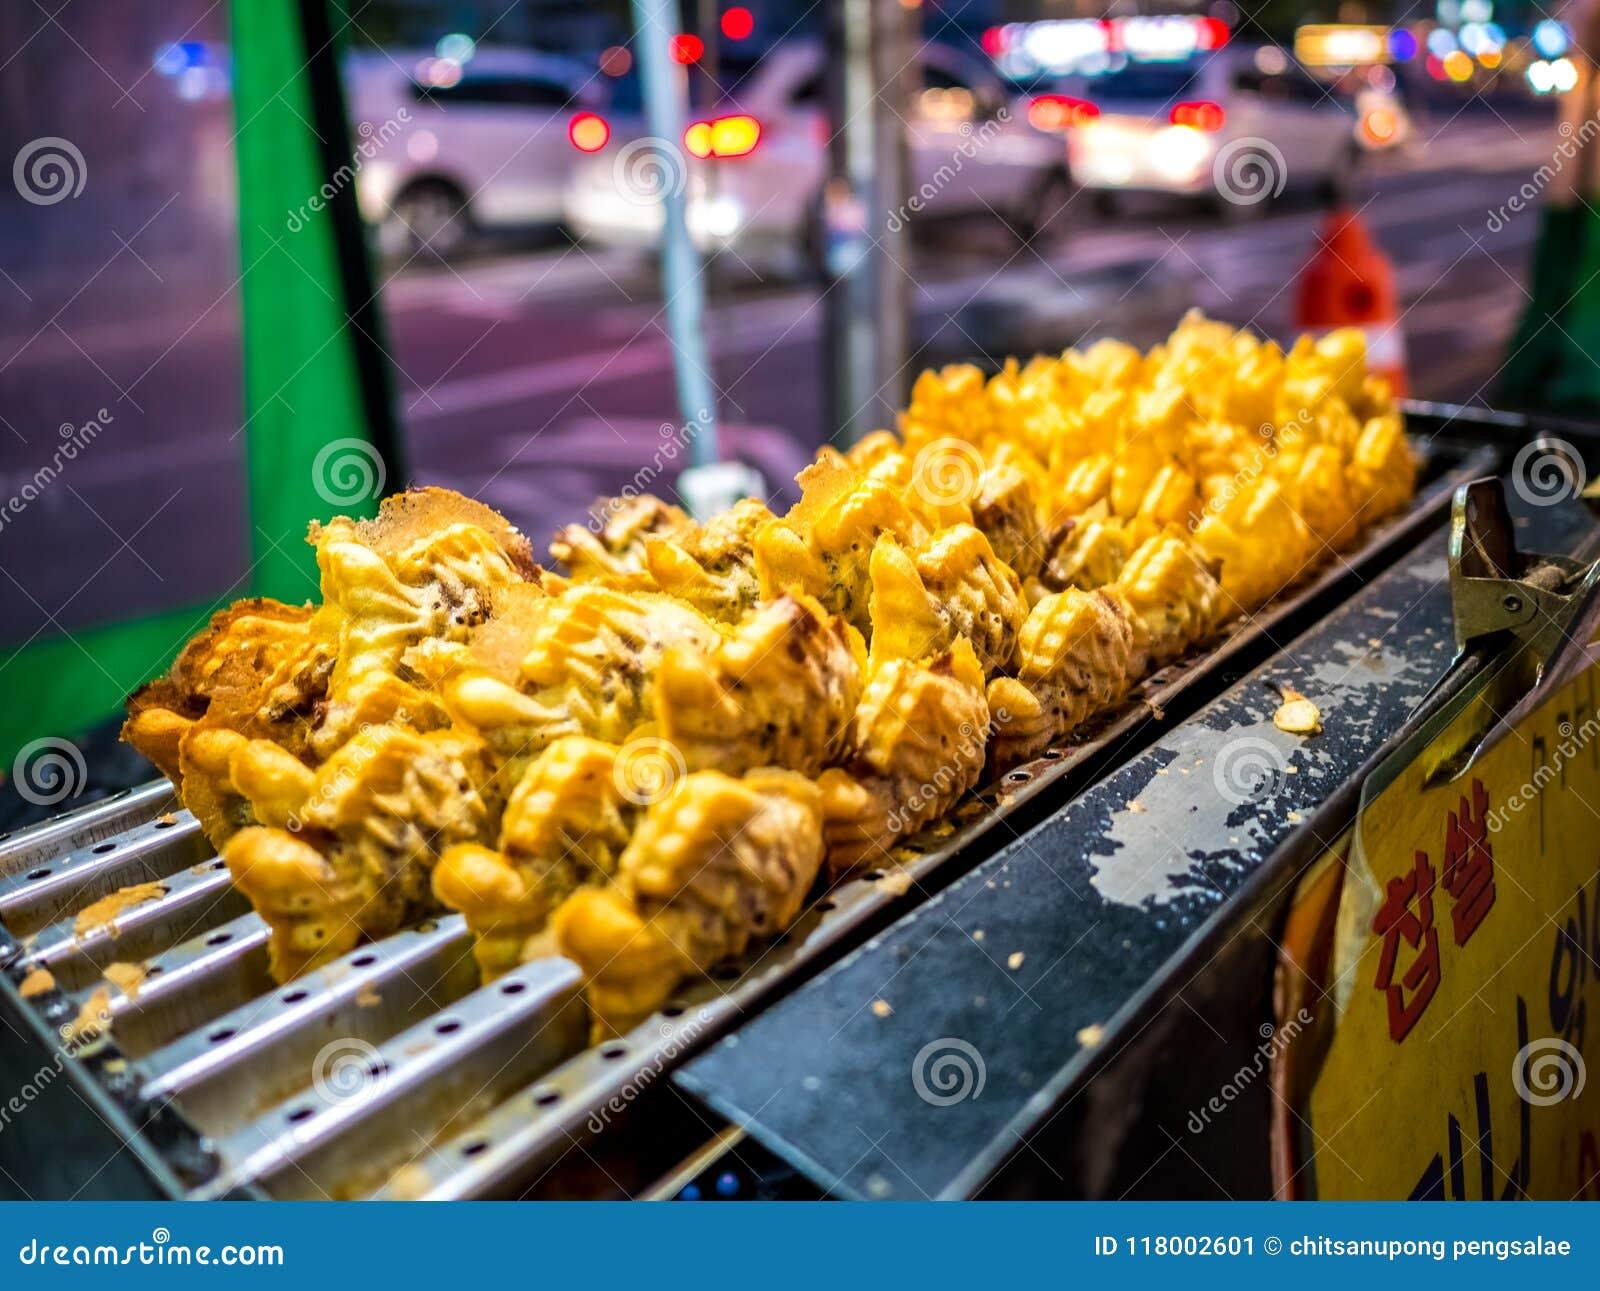 Bungeoppang Traditional Korean Food In Local Market Street Food